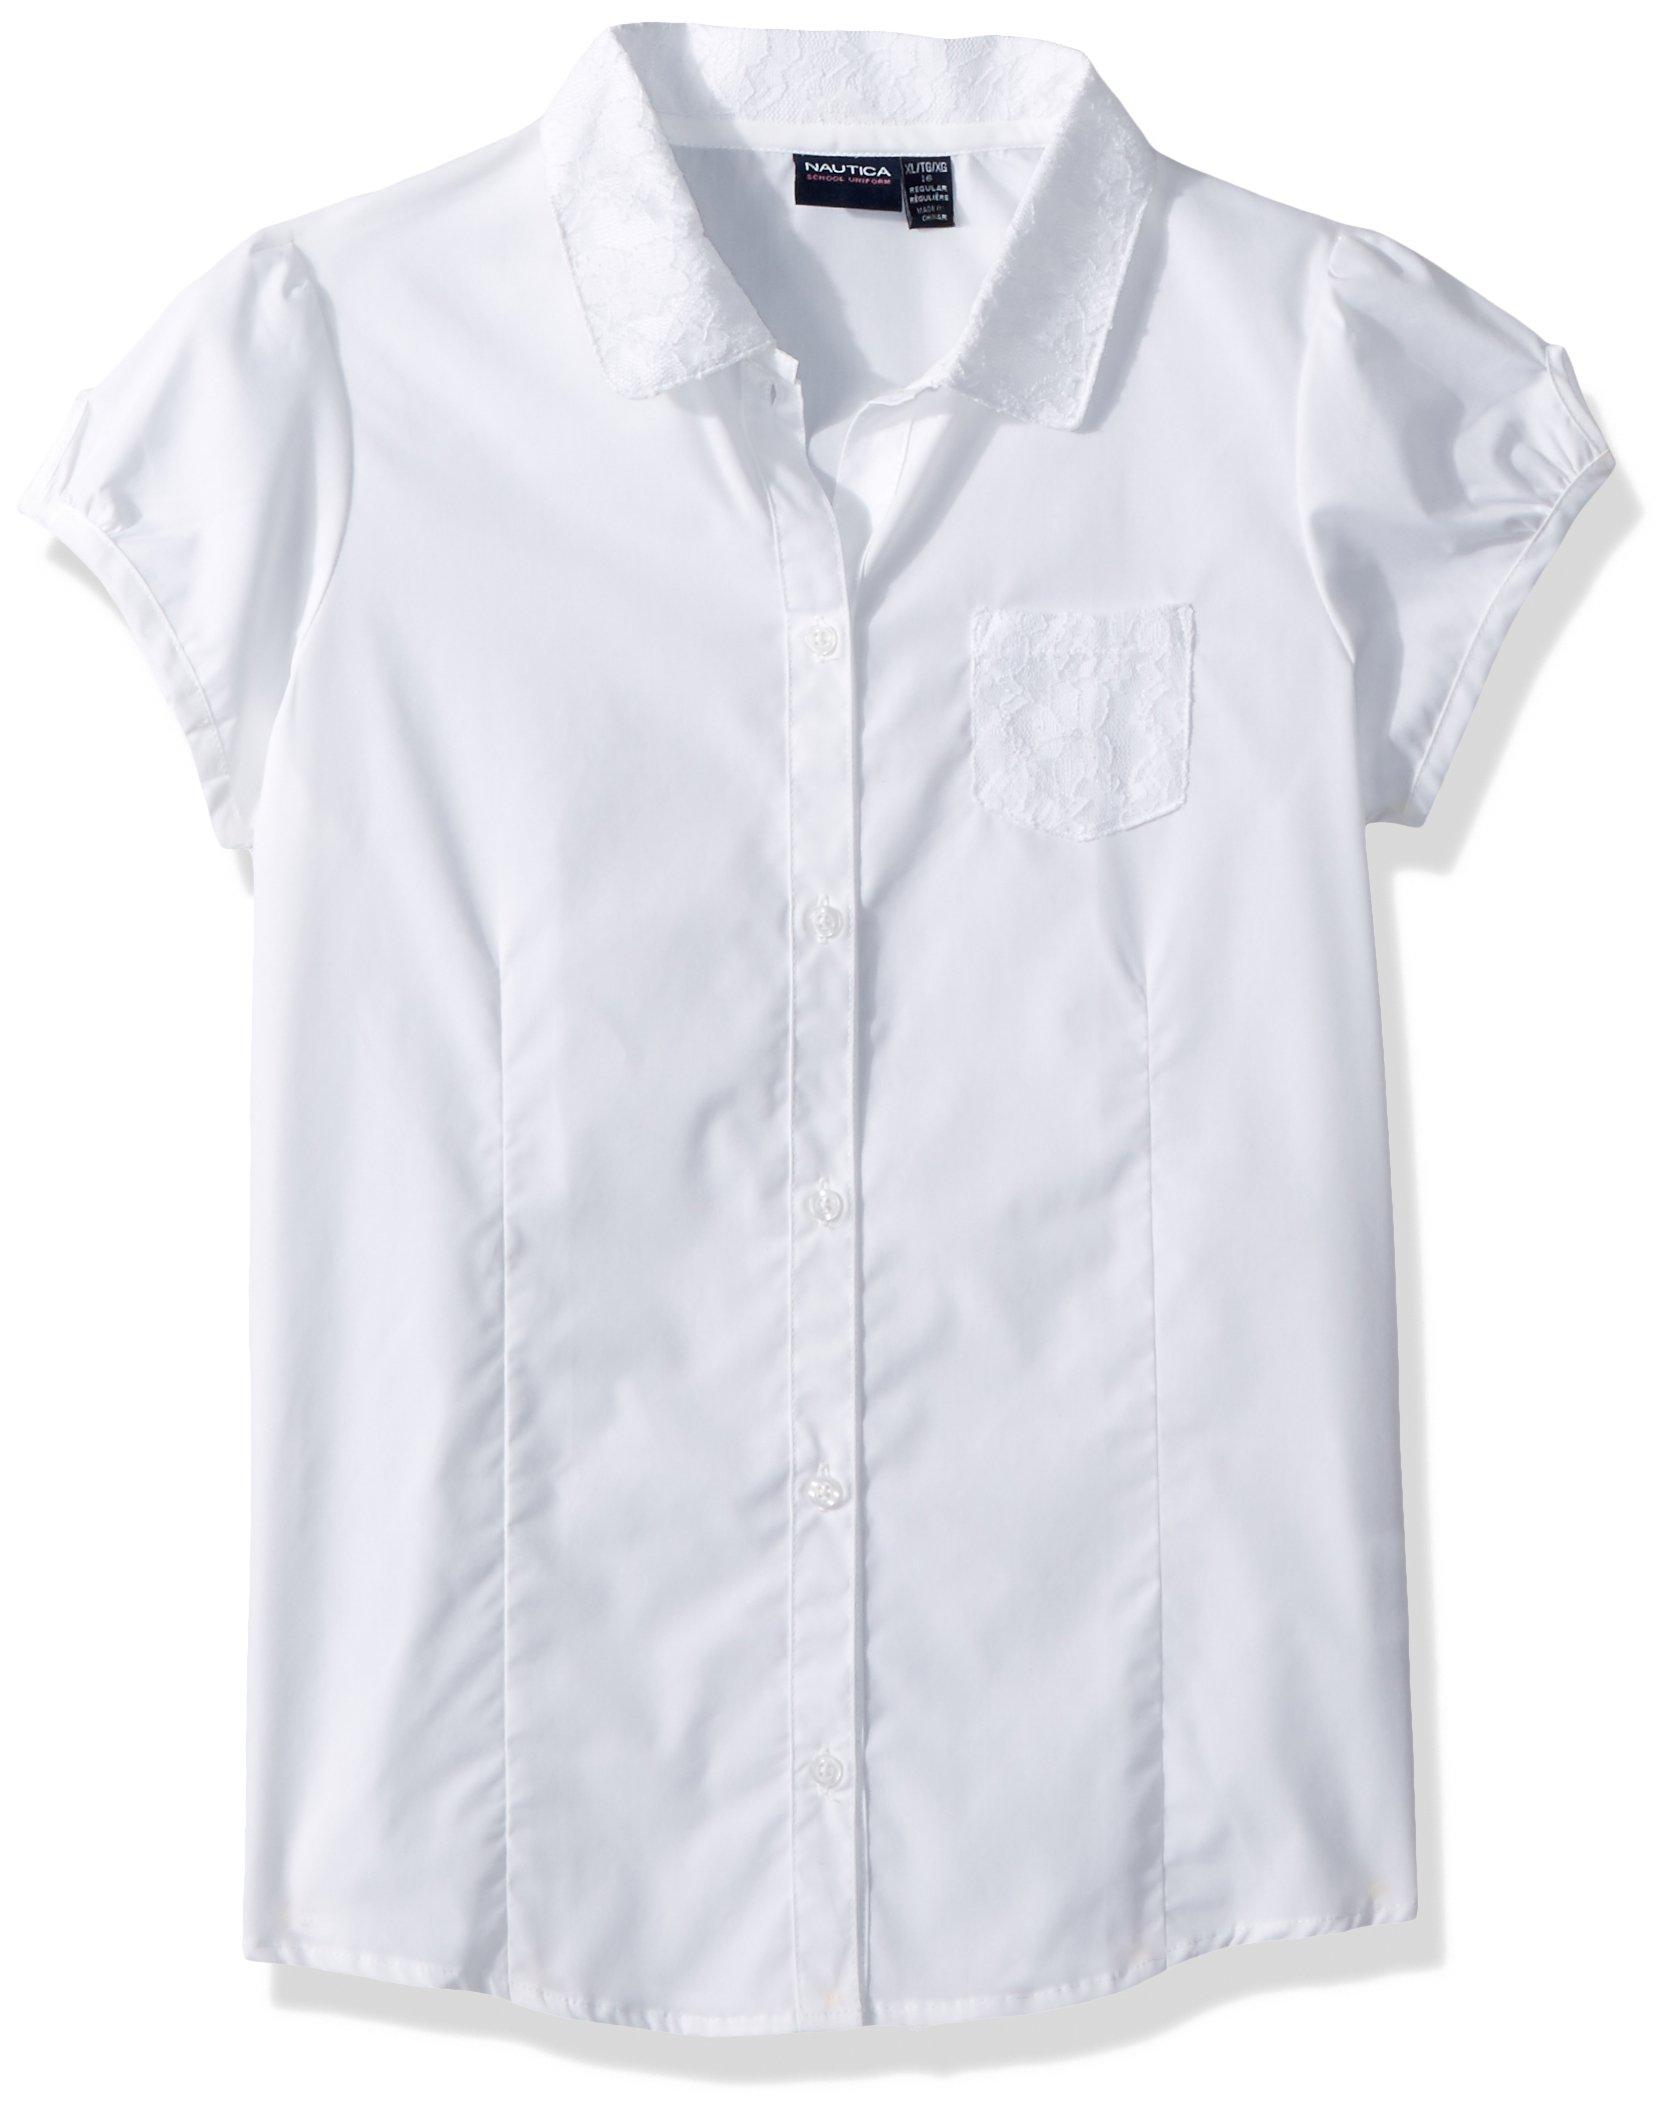 Nautica Girls' Big Uniform Short-Sleeve Blouse, White/lace, S (7)